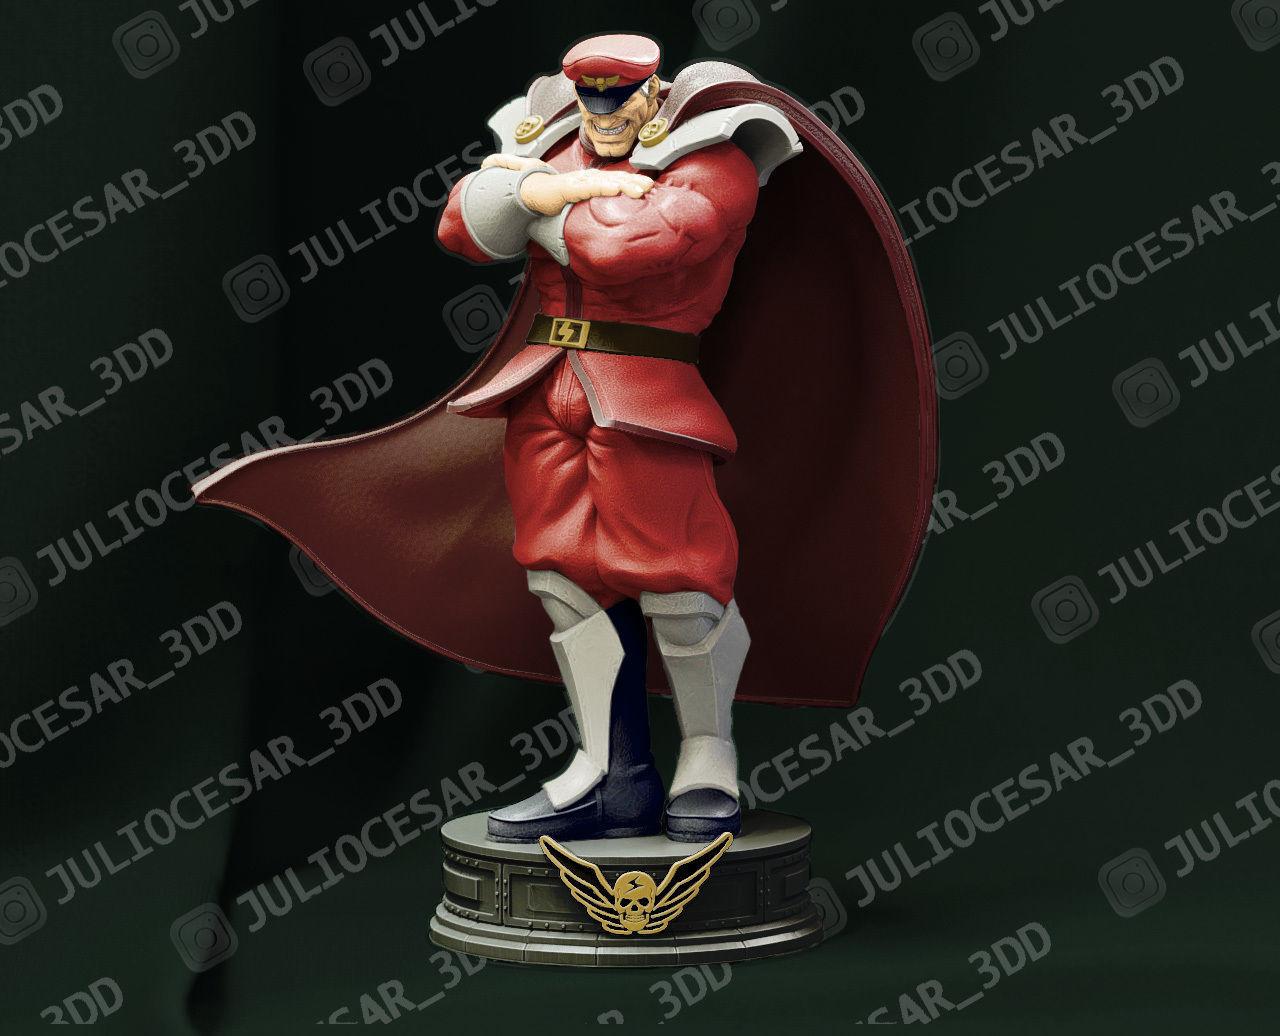 Street Fighter - M Bison Shadaloo dictator